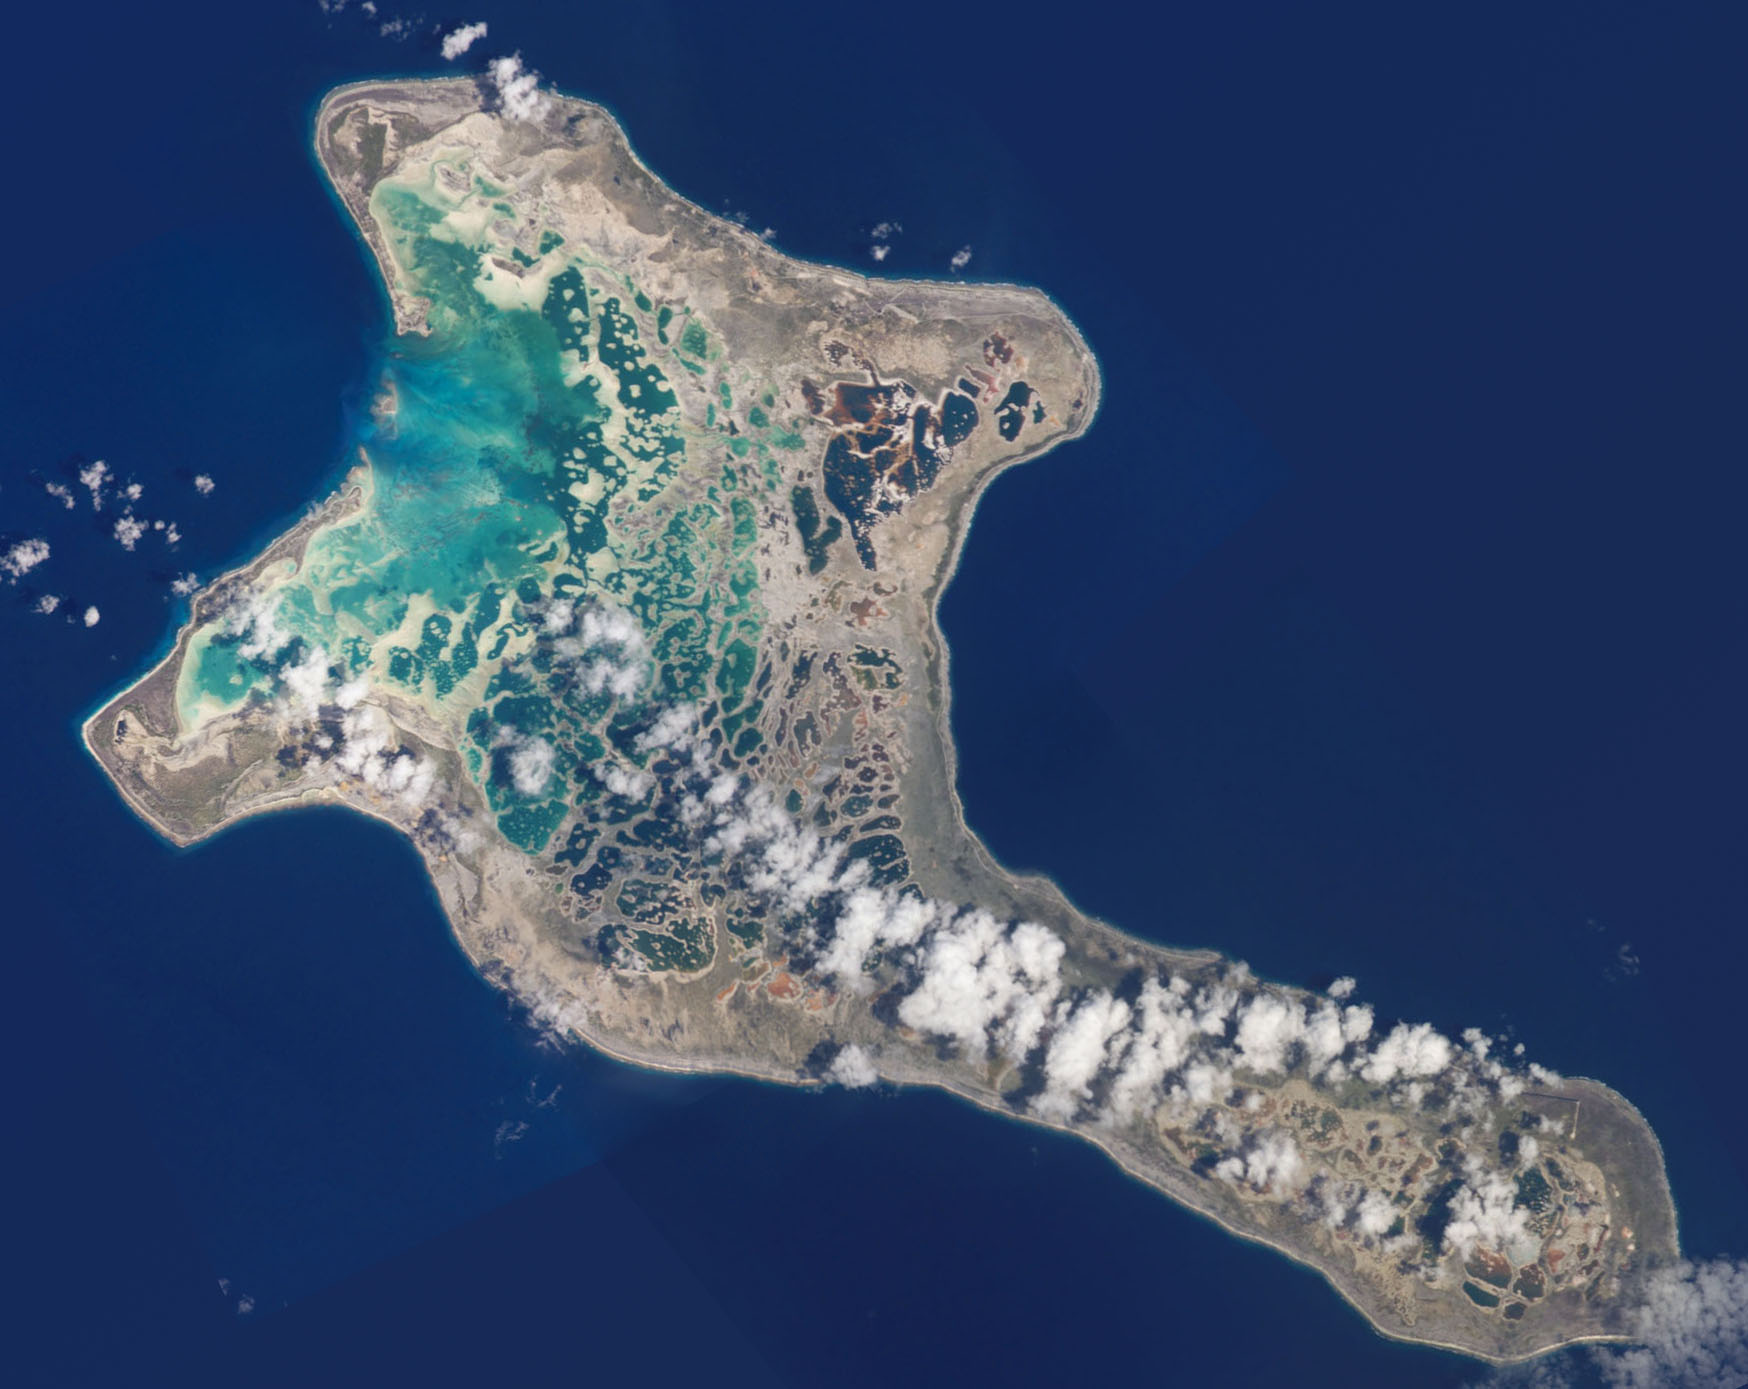 Kiritimati-Kiribati